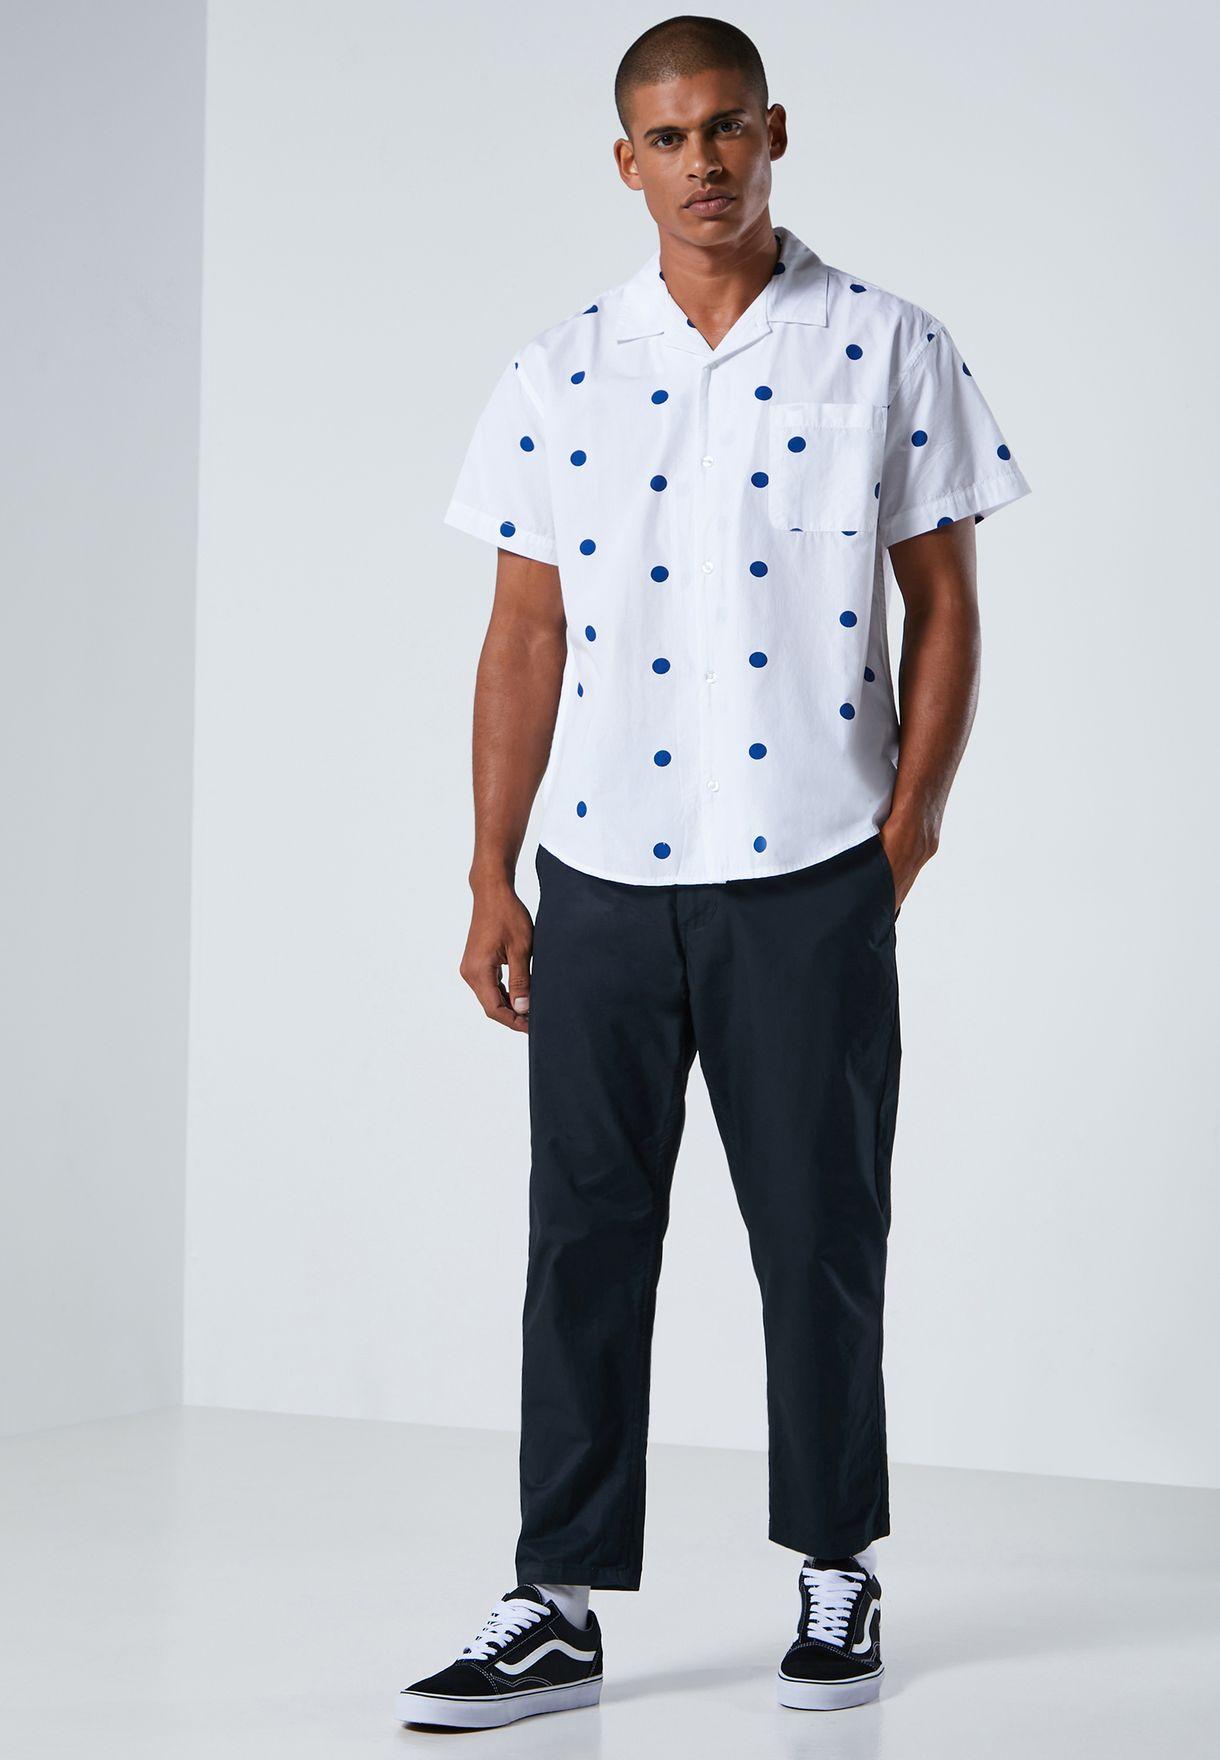 Nick Woven Shirt